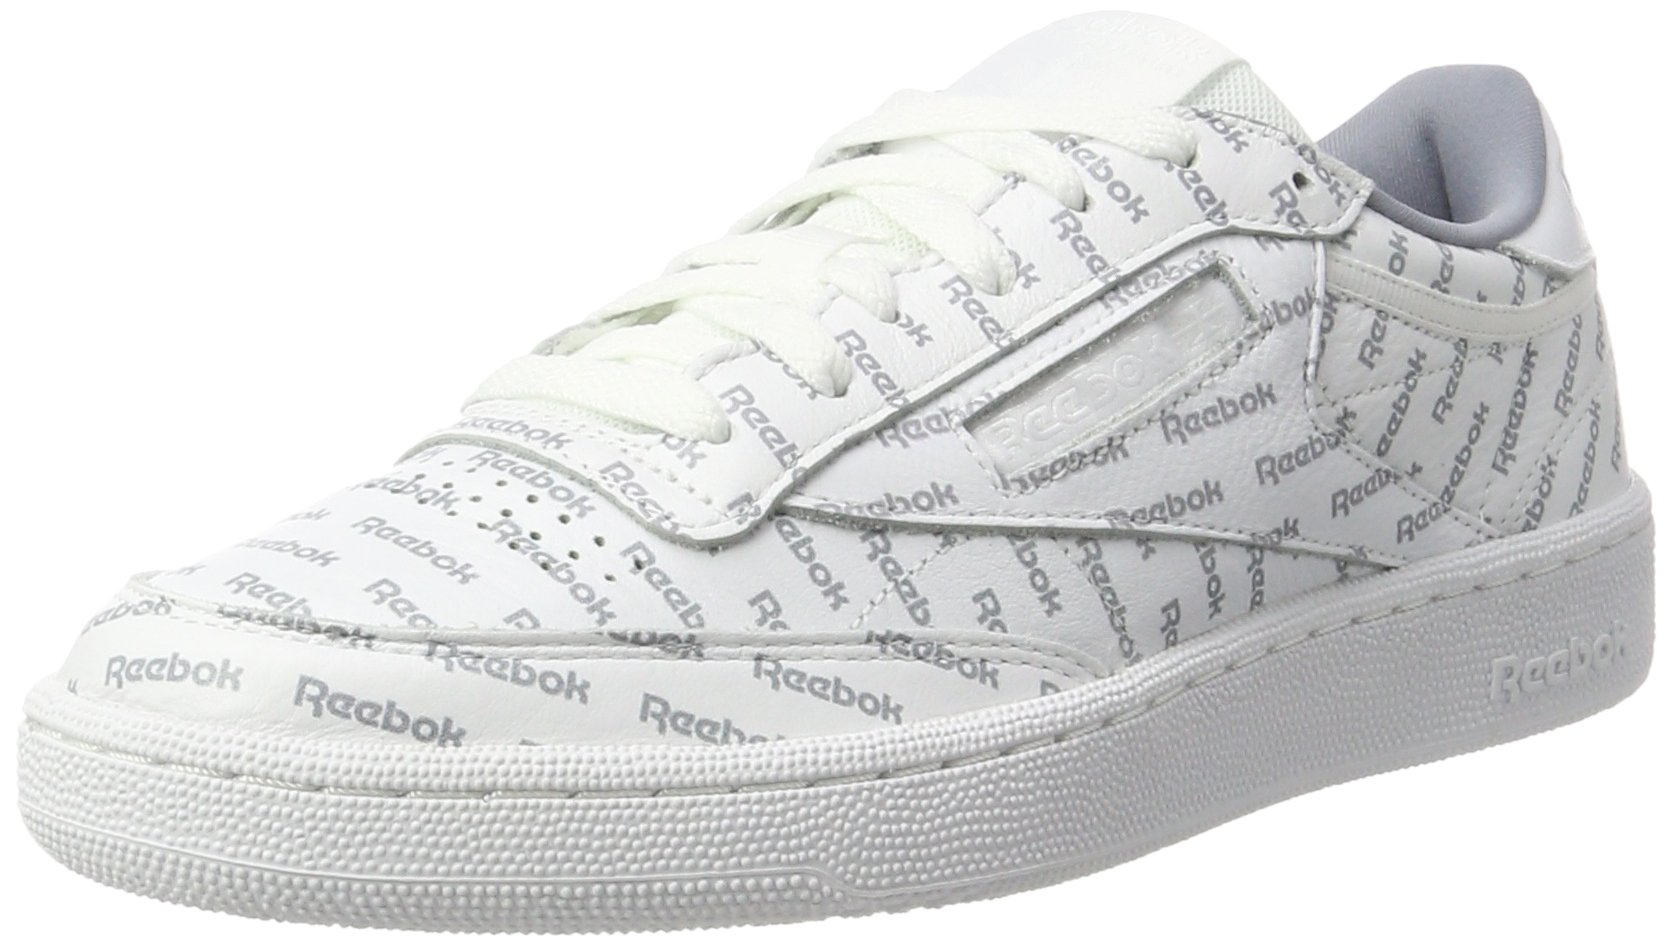 brand new 806b9 d863b adidas Herren Continental 80 Fitnessschuhe. Reebok Club C 85 W Shoes.  Reebok Men s Club C 85 So Gymnastics Shoes Black